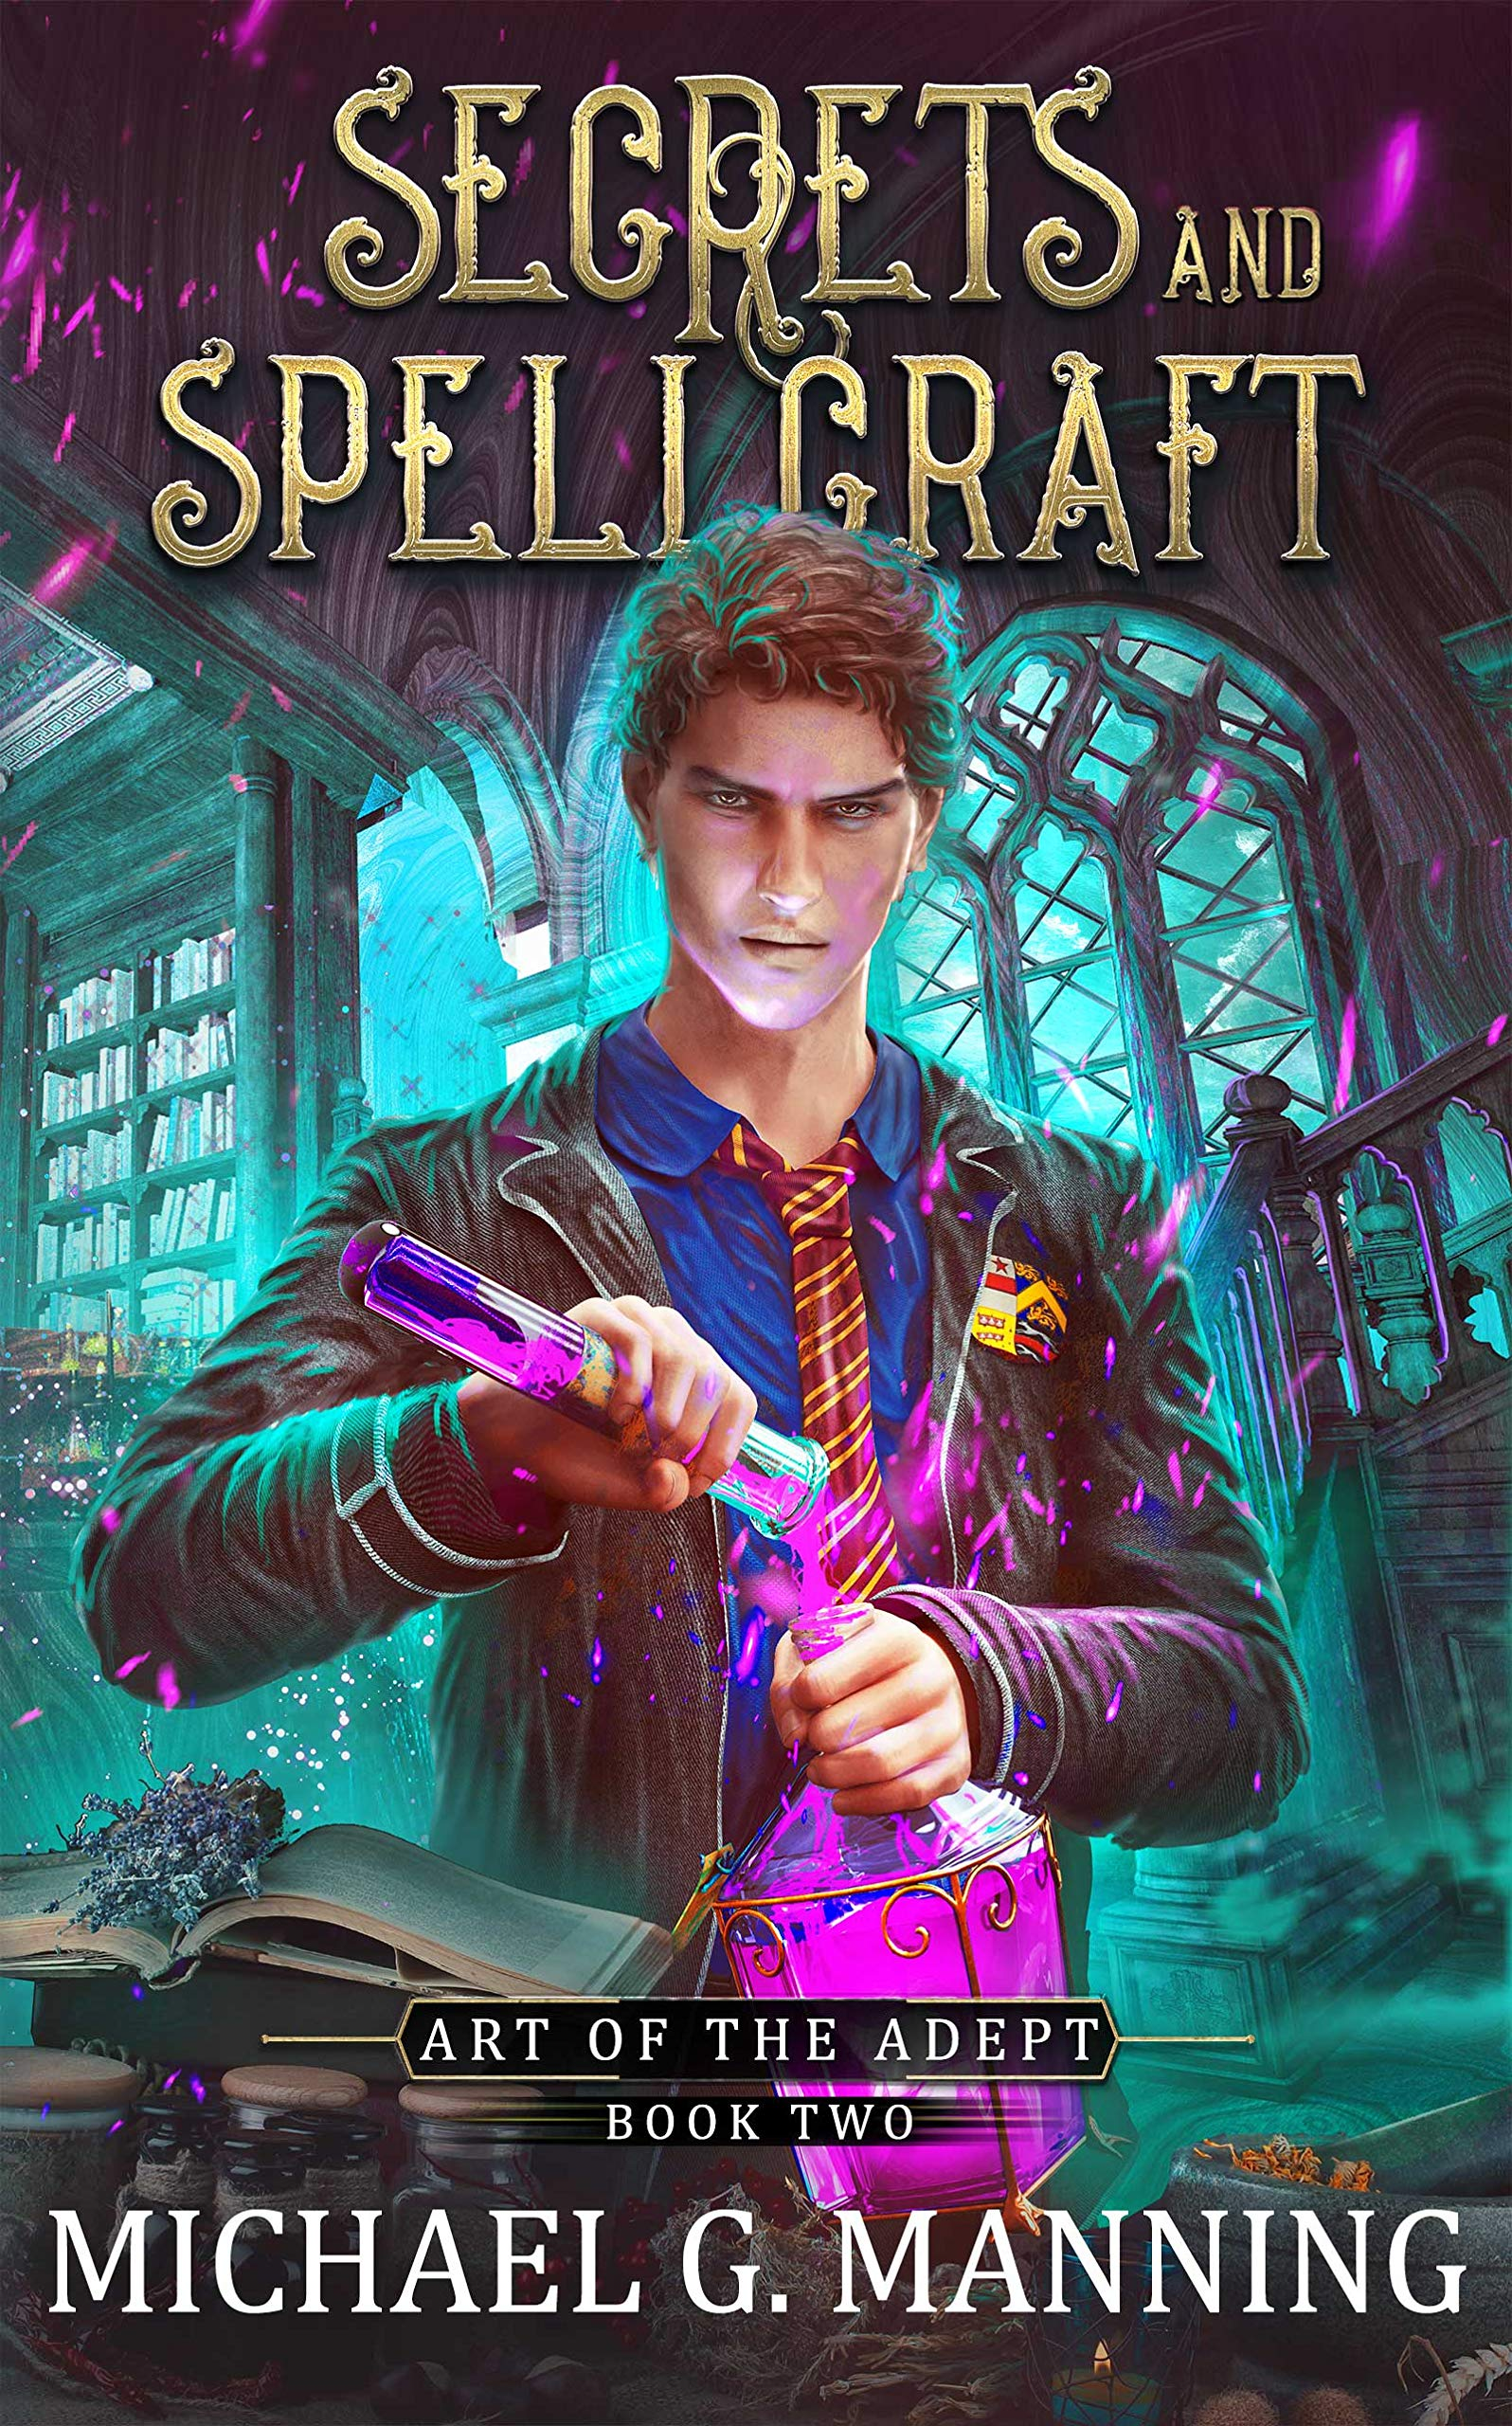 Secrets and Spellcraft (Art of the Adept Book 2)